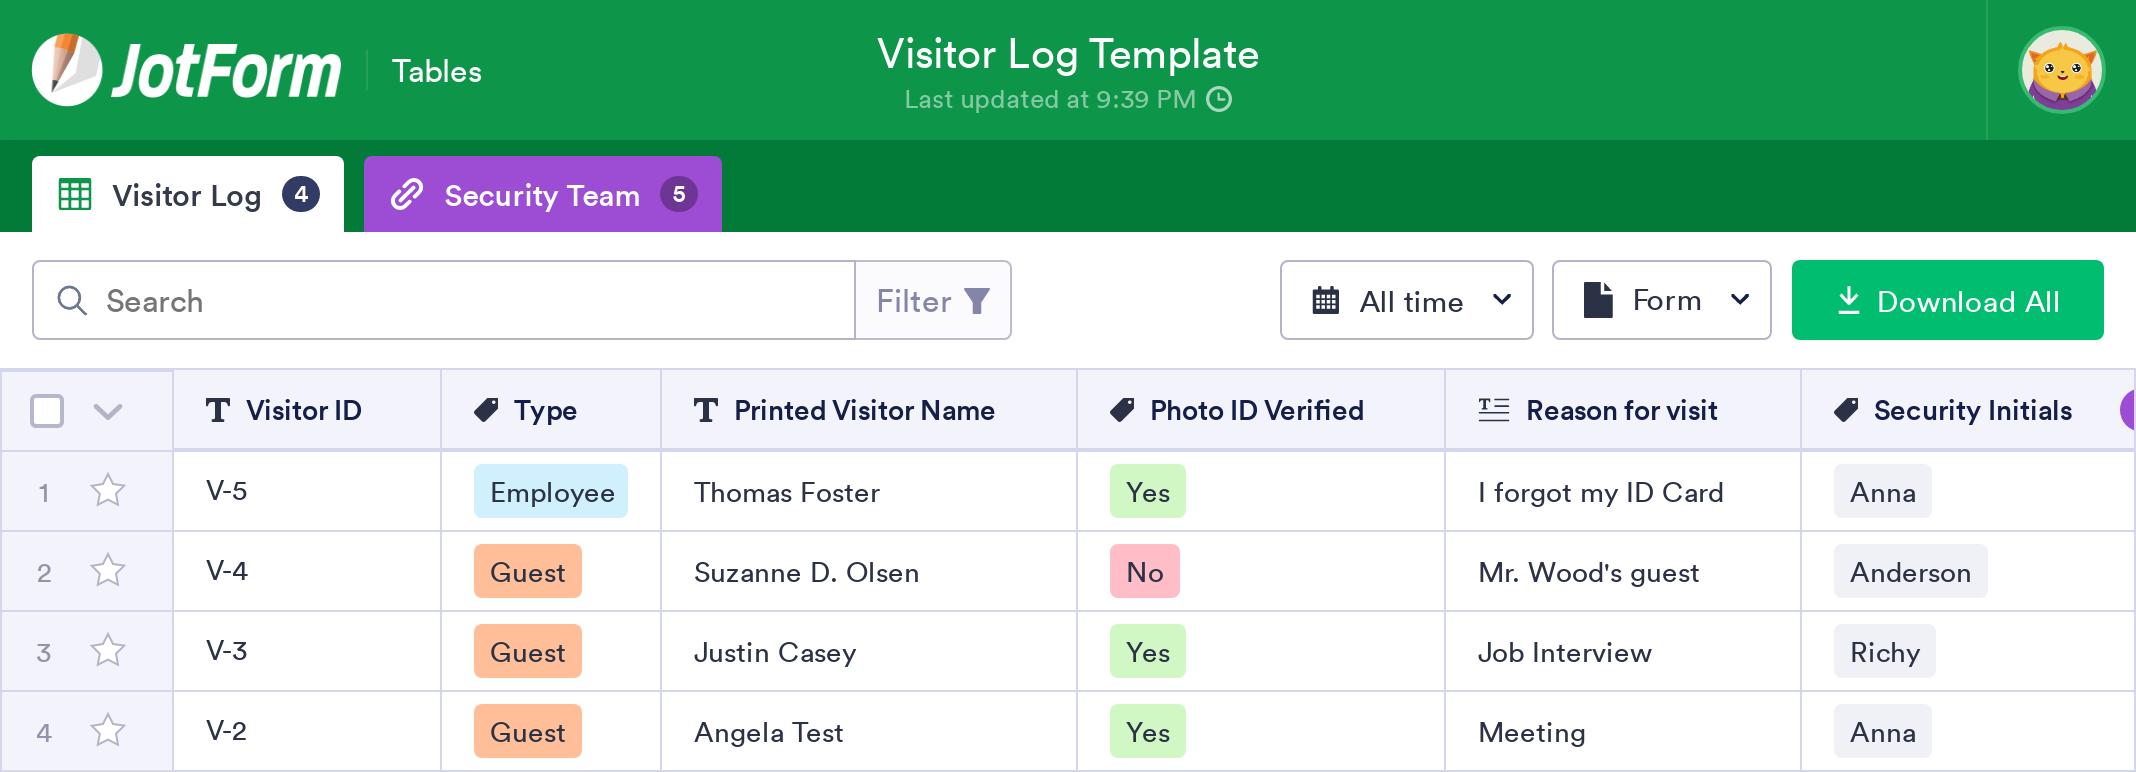 Visitor Log Template